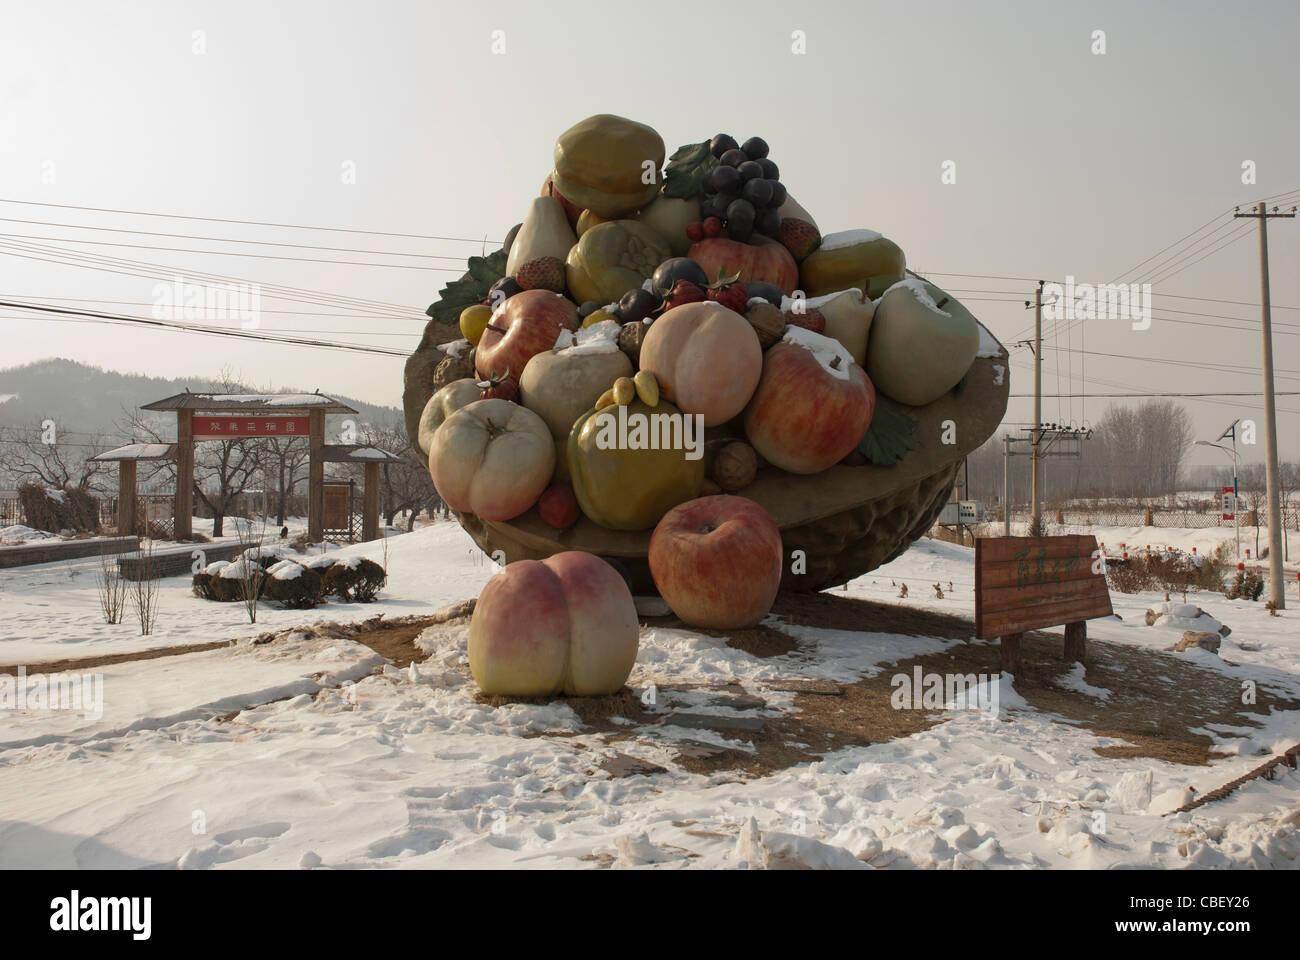 Monumental sculpture in a Chinese village symbolizing abundance - Stock Image